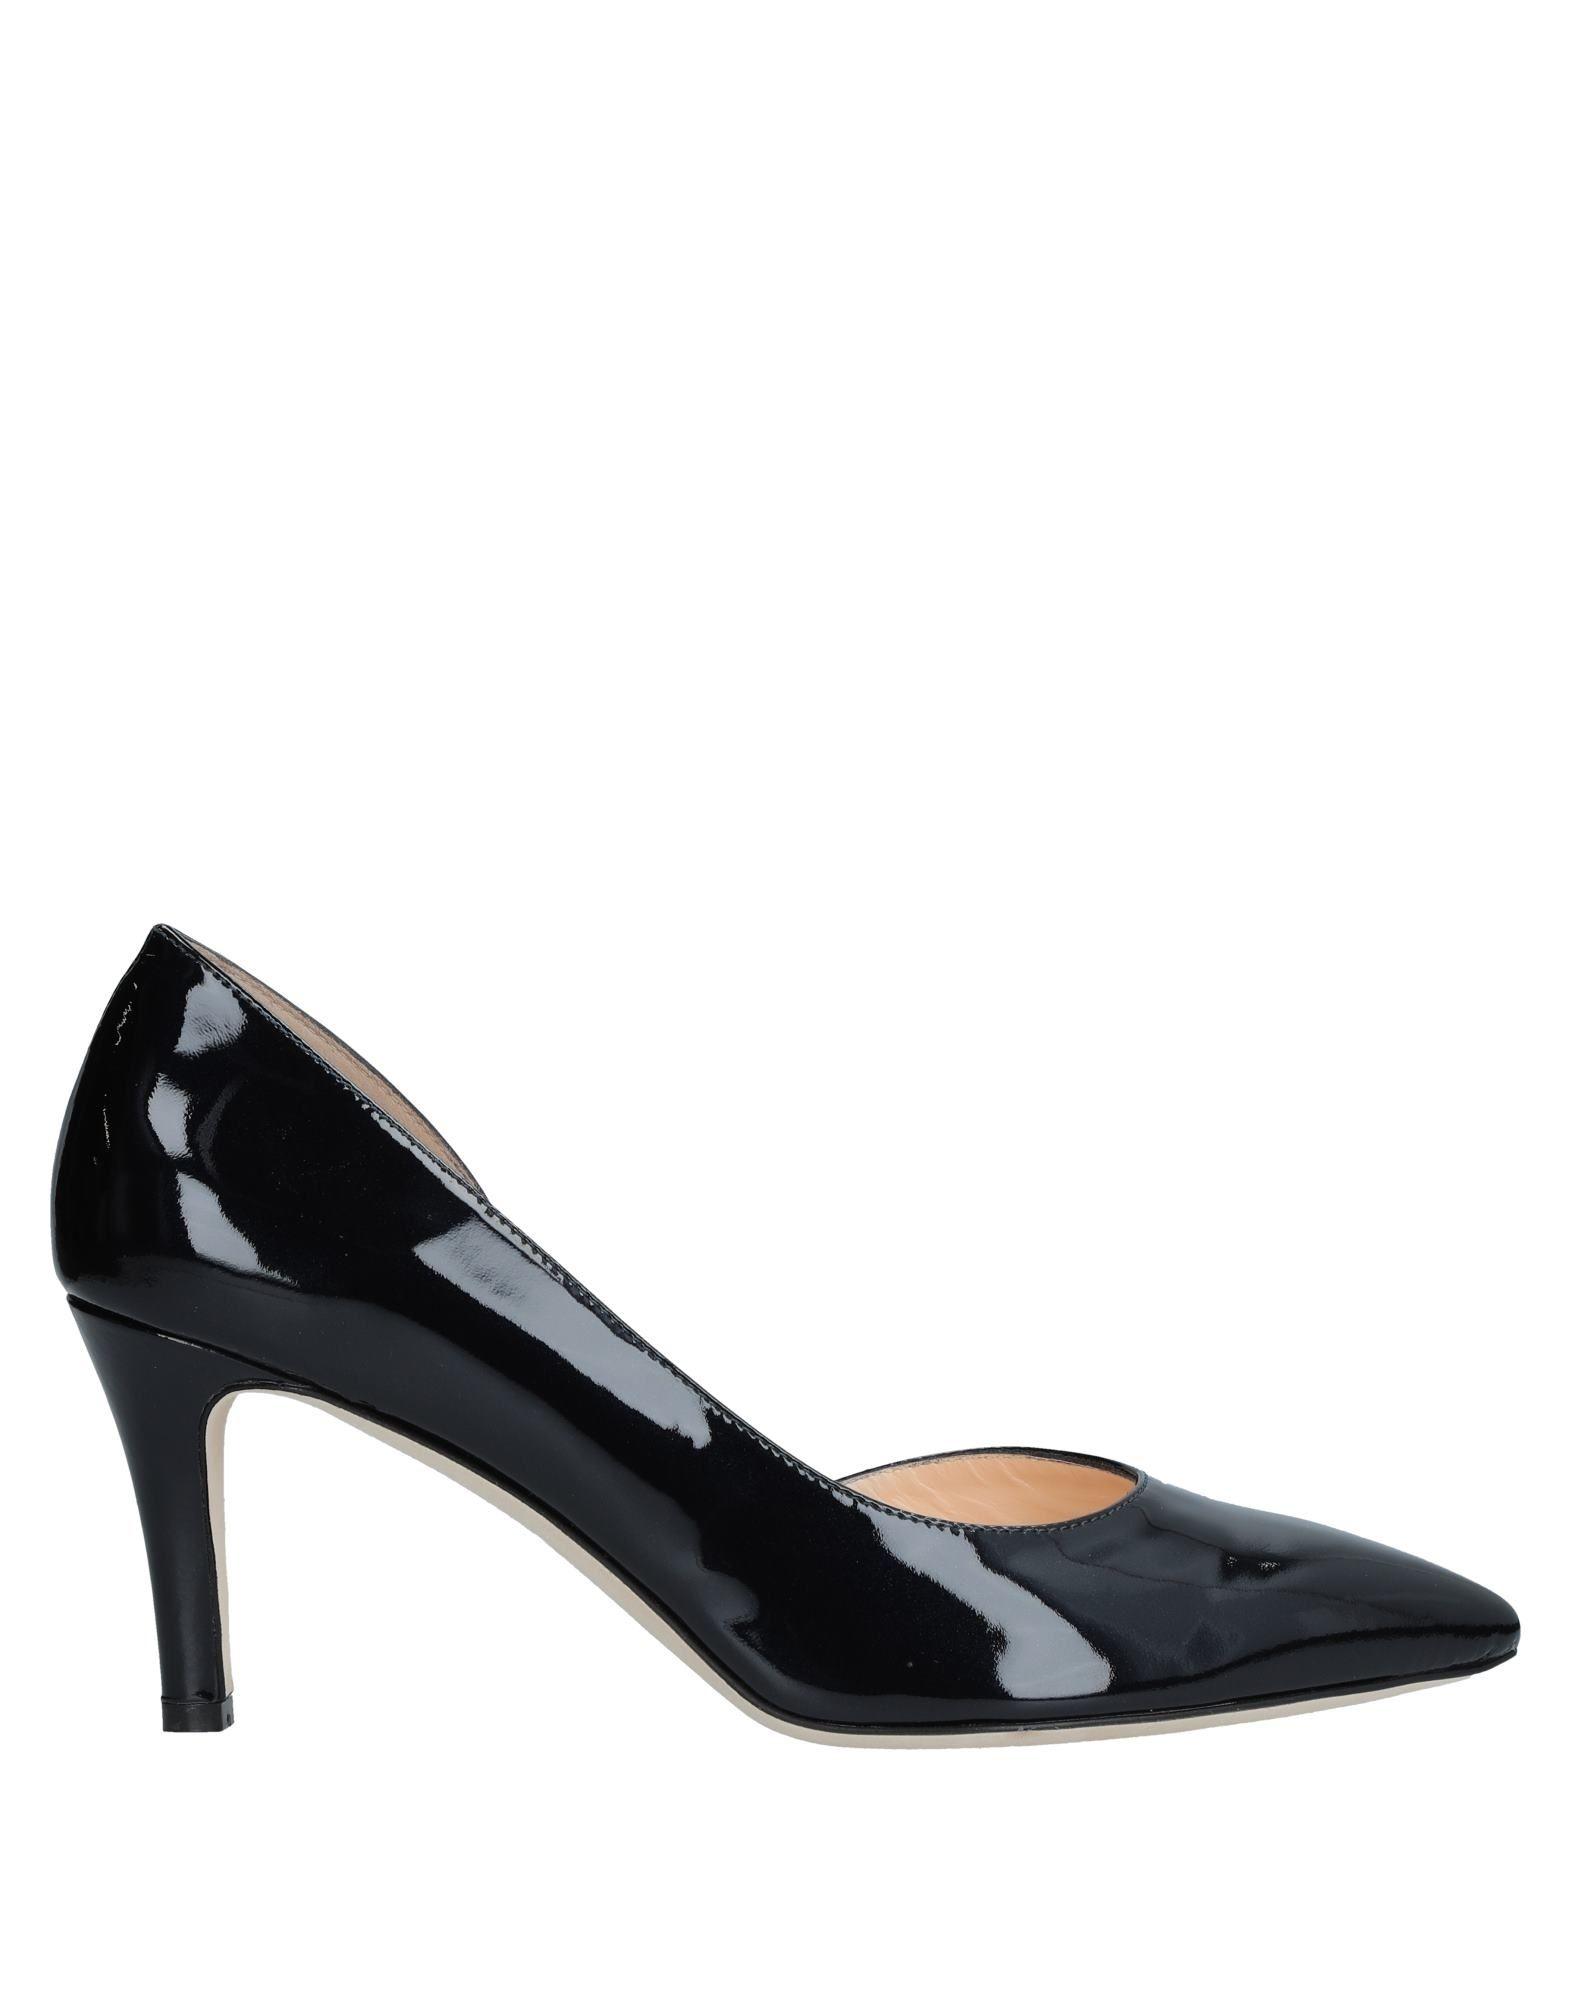 Sandali Nuove Fru.It Donna - 11161216LN Nuove Sandali offerte e scarpe comode 8b8939